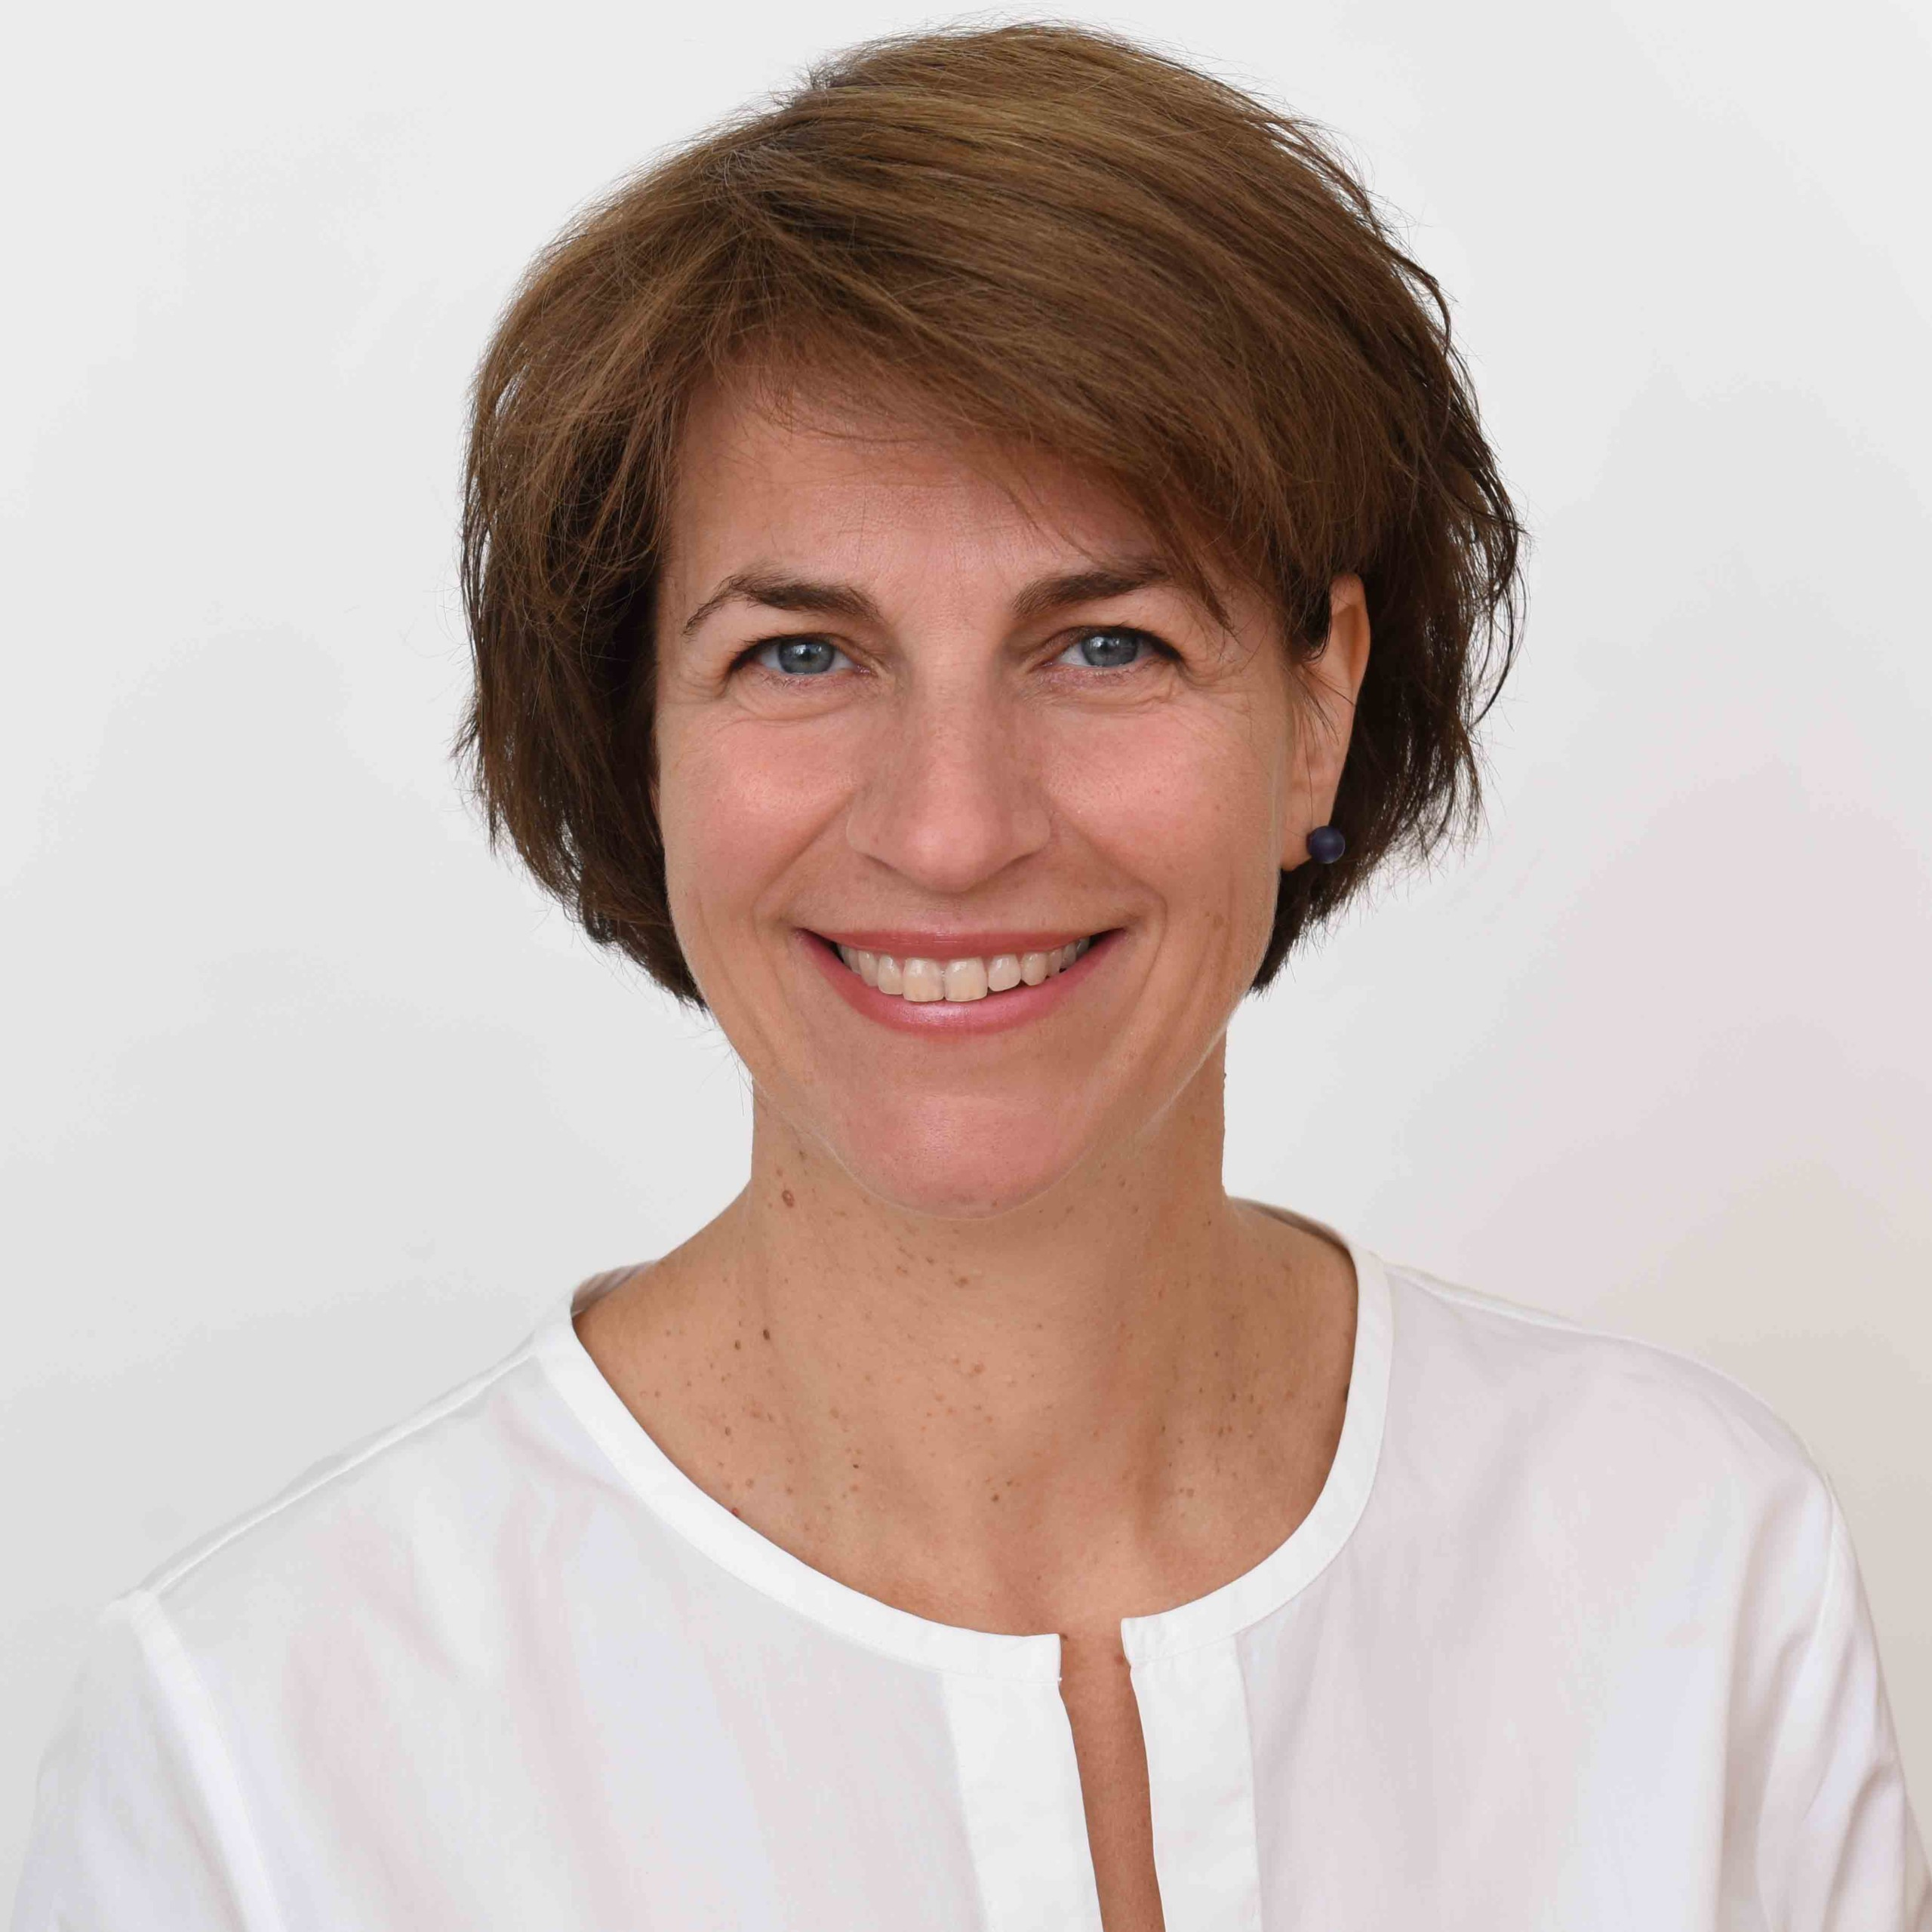 Portraitbild von Frau Dr. Katja Arzt